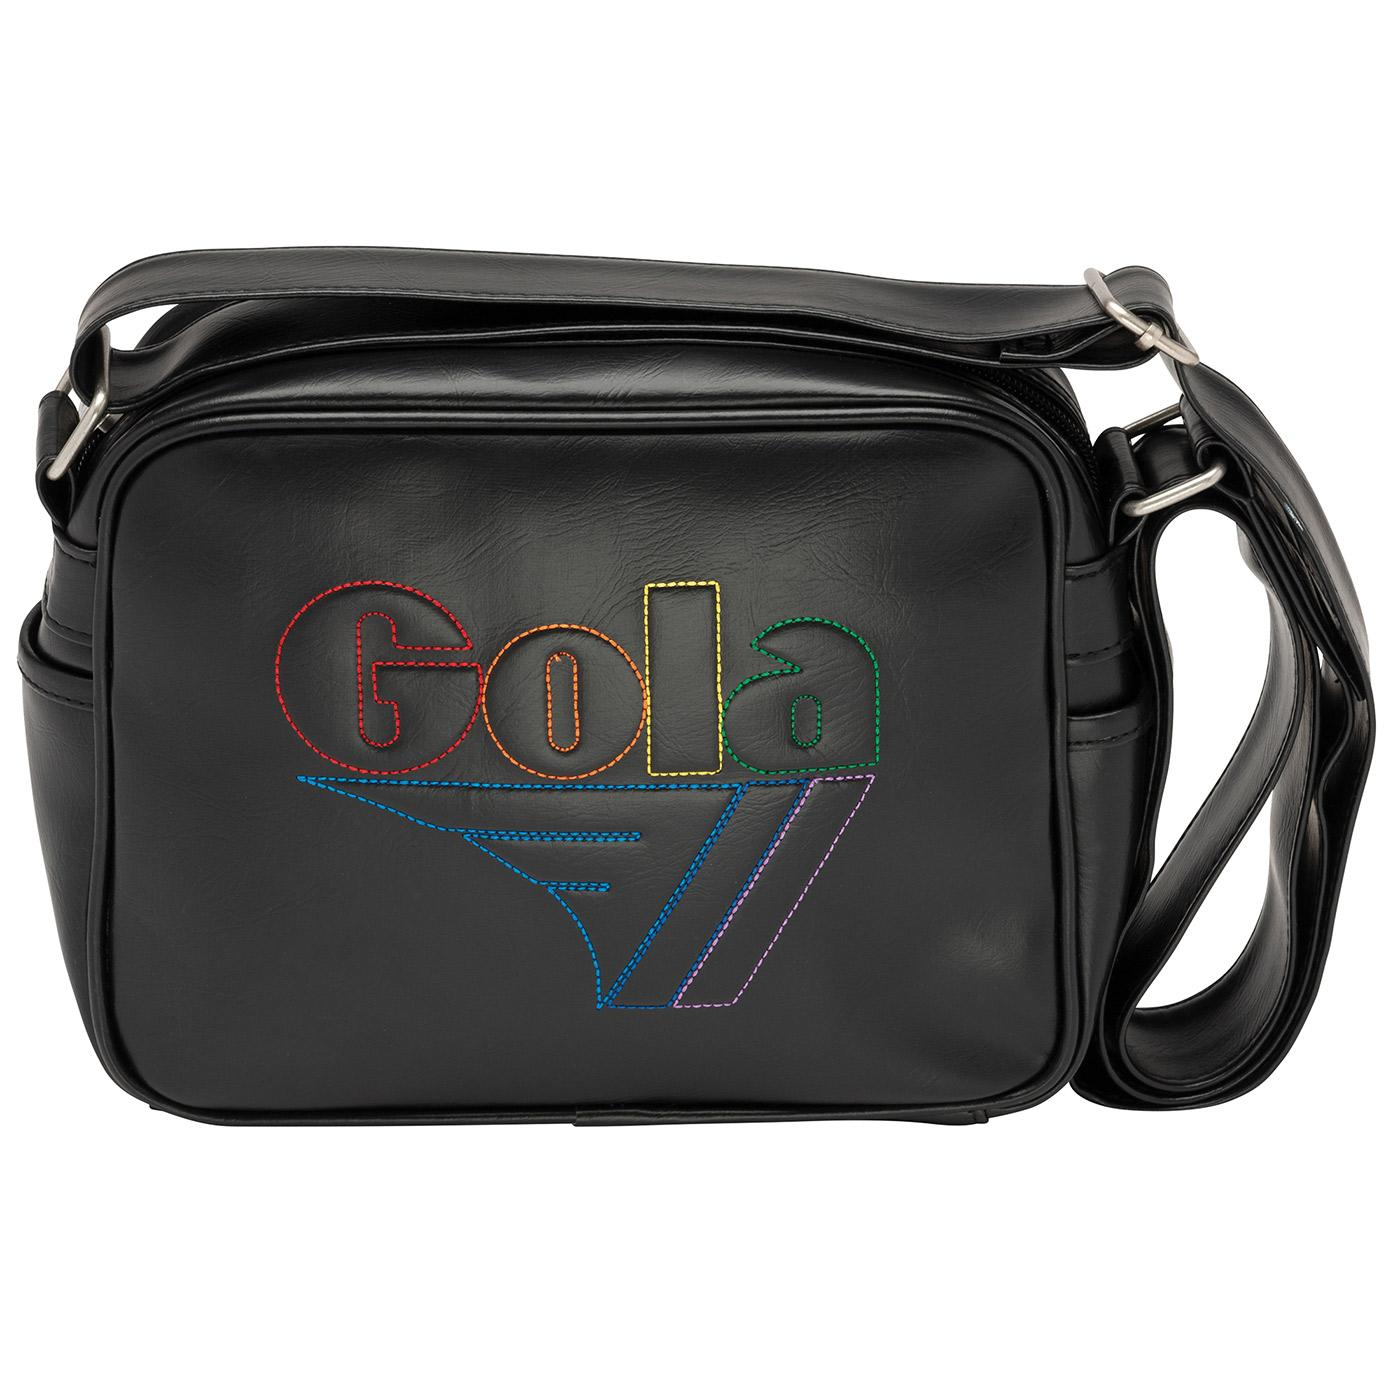 GOLA Redford Rainbow Stitch Retro 70s Shoulder Bag